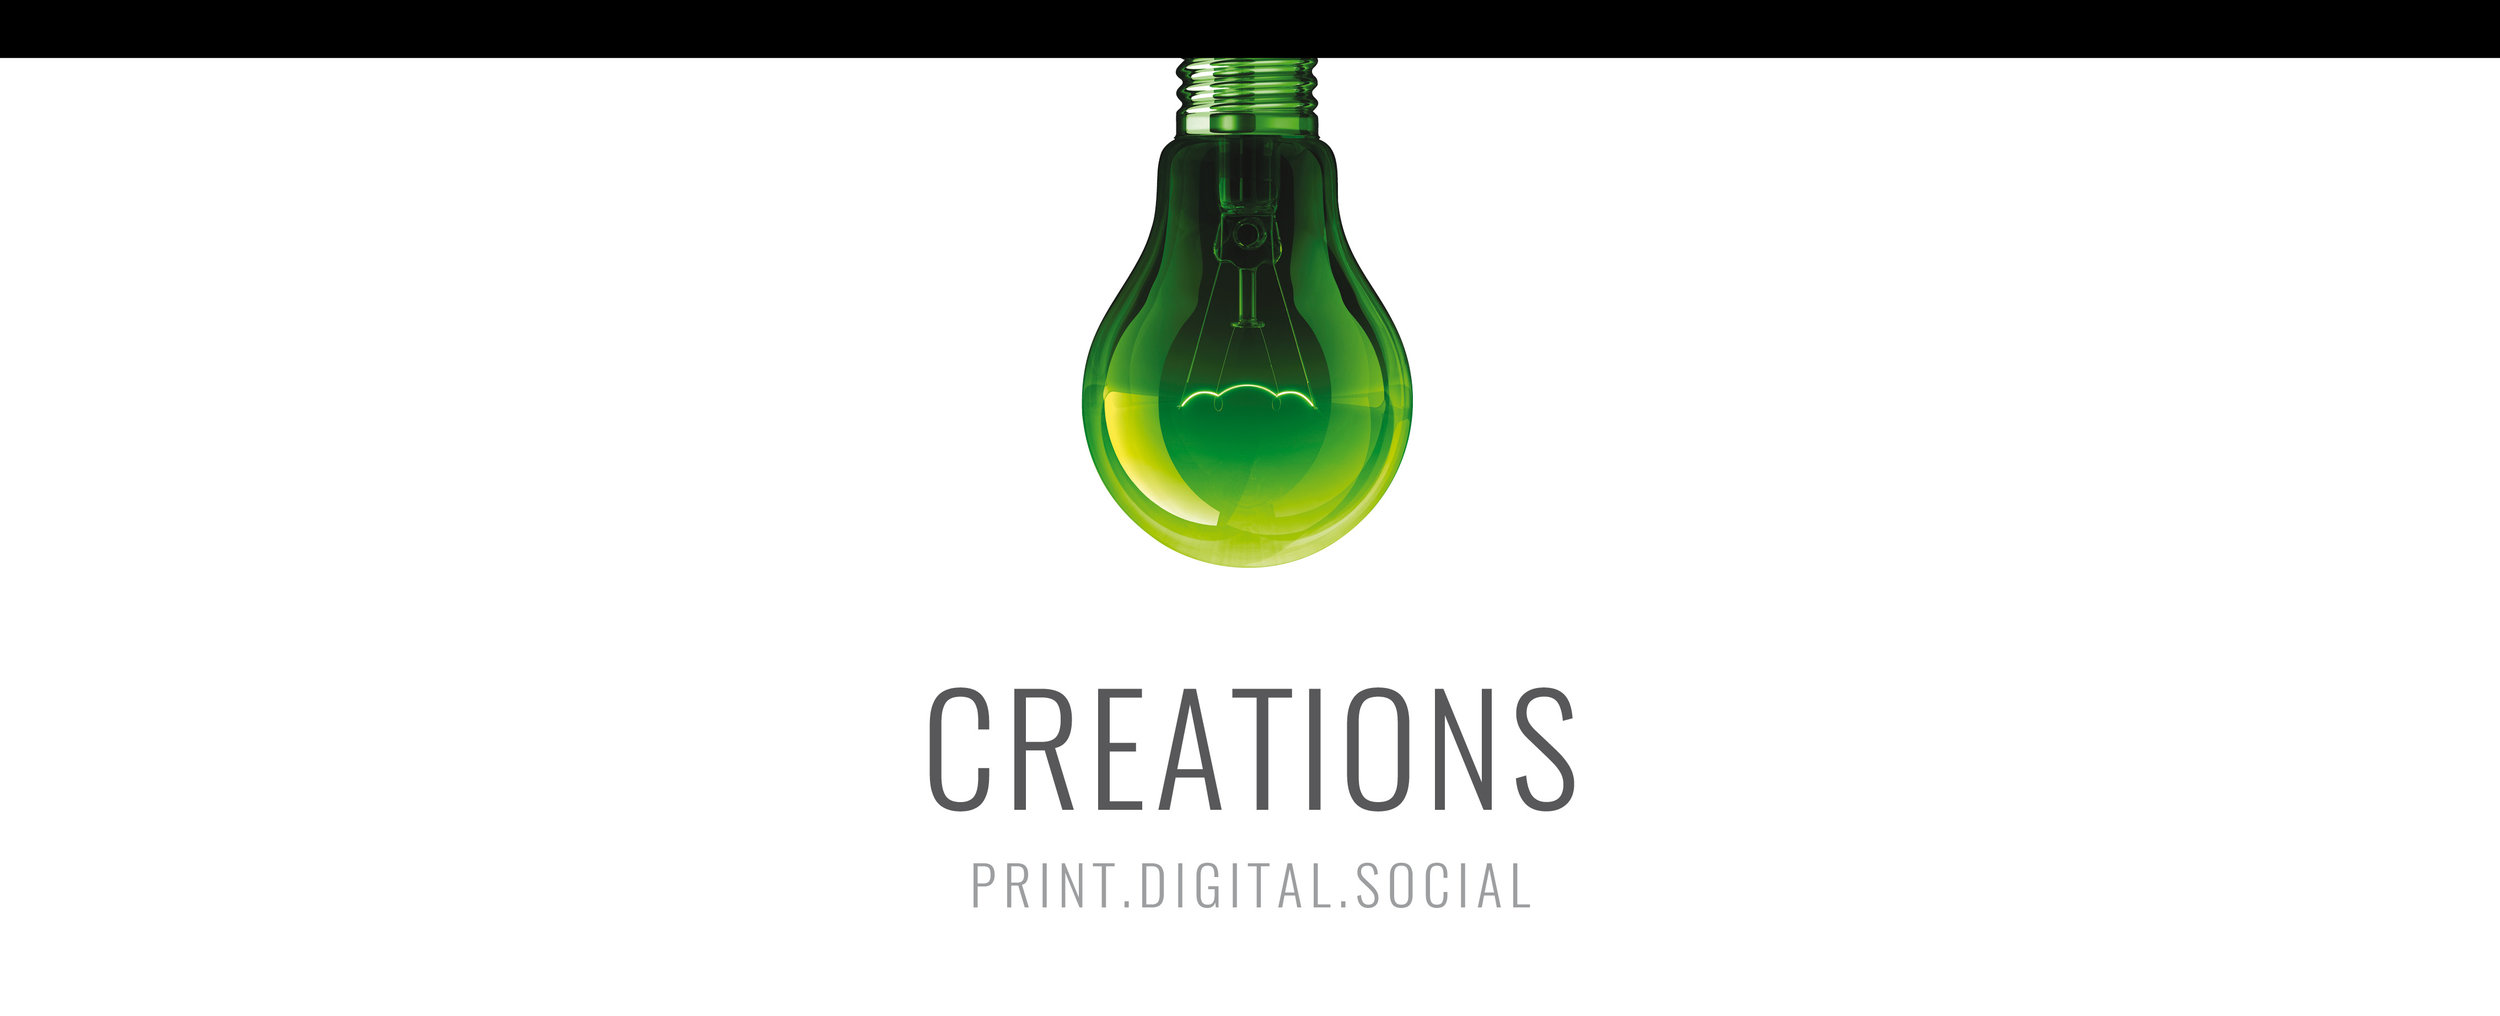 Synergy-Graphics-Web-Header-Creations.jpg